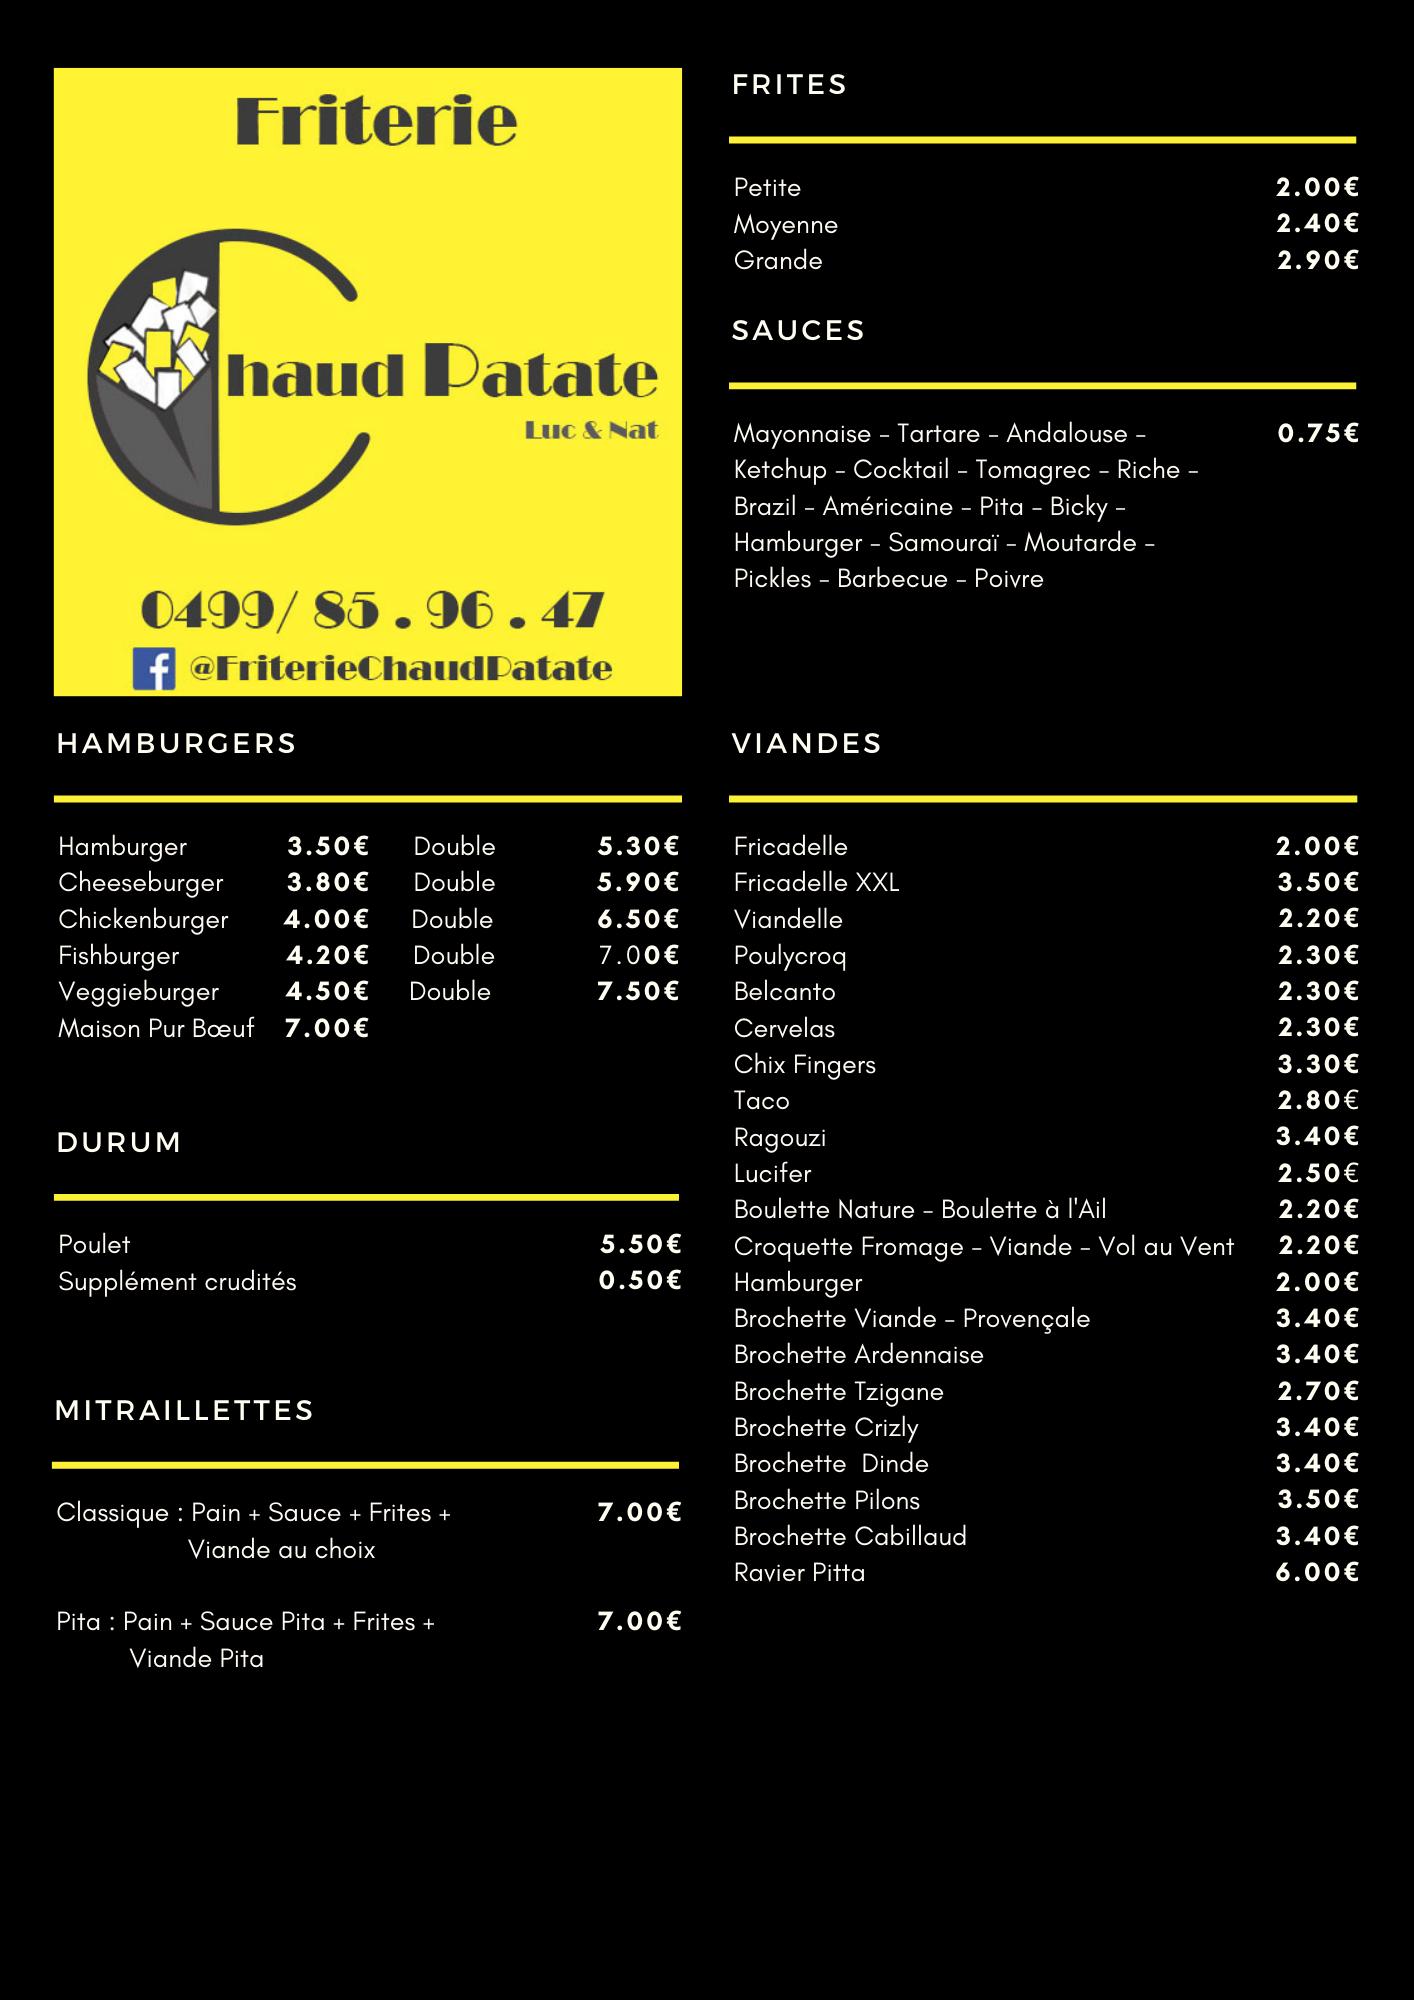 Chaud Patate - Carte 1